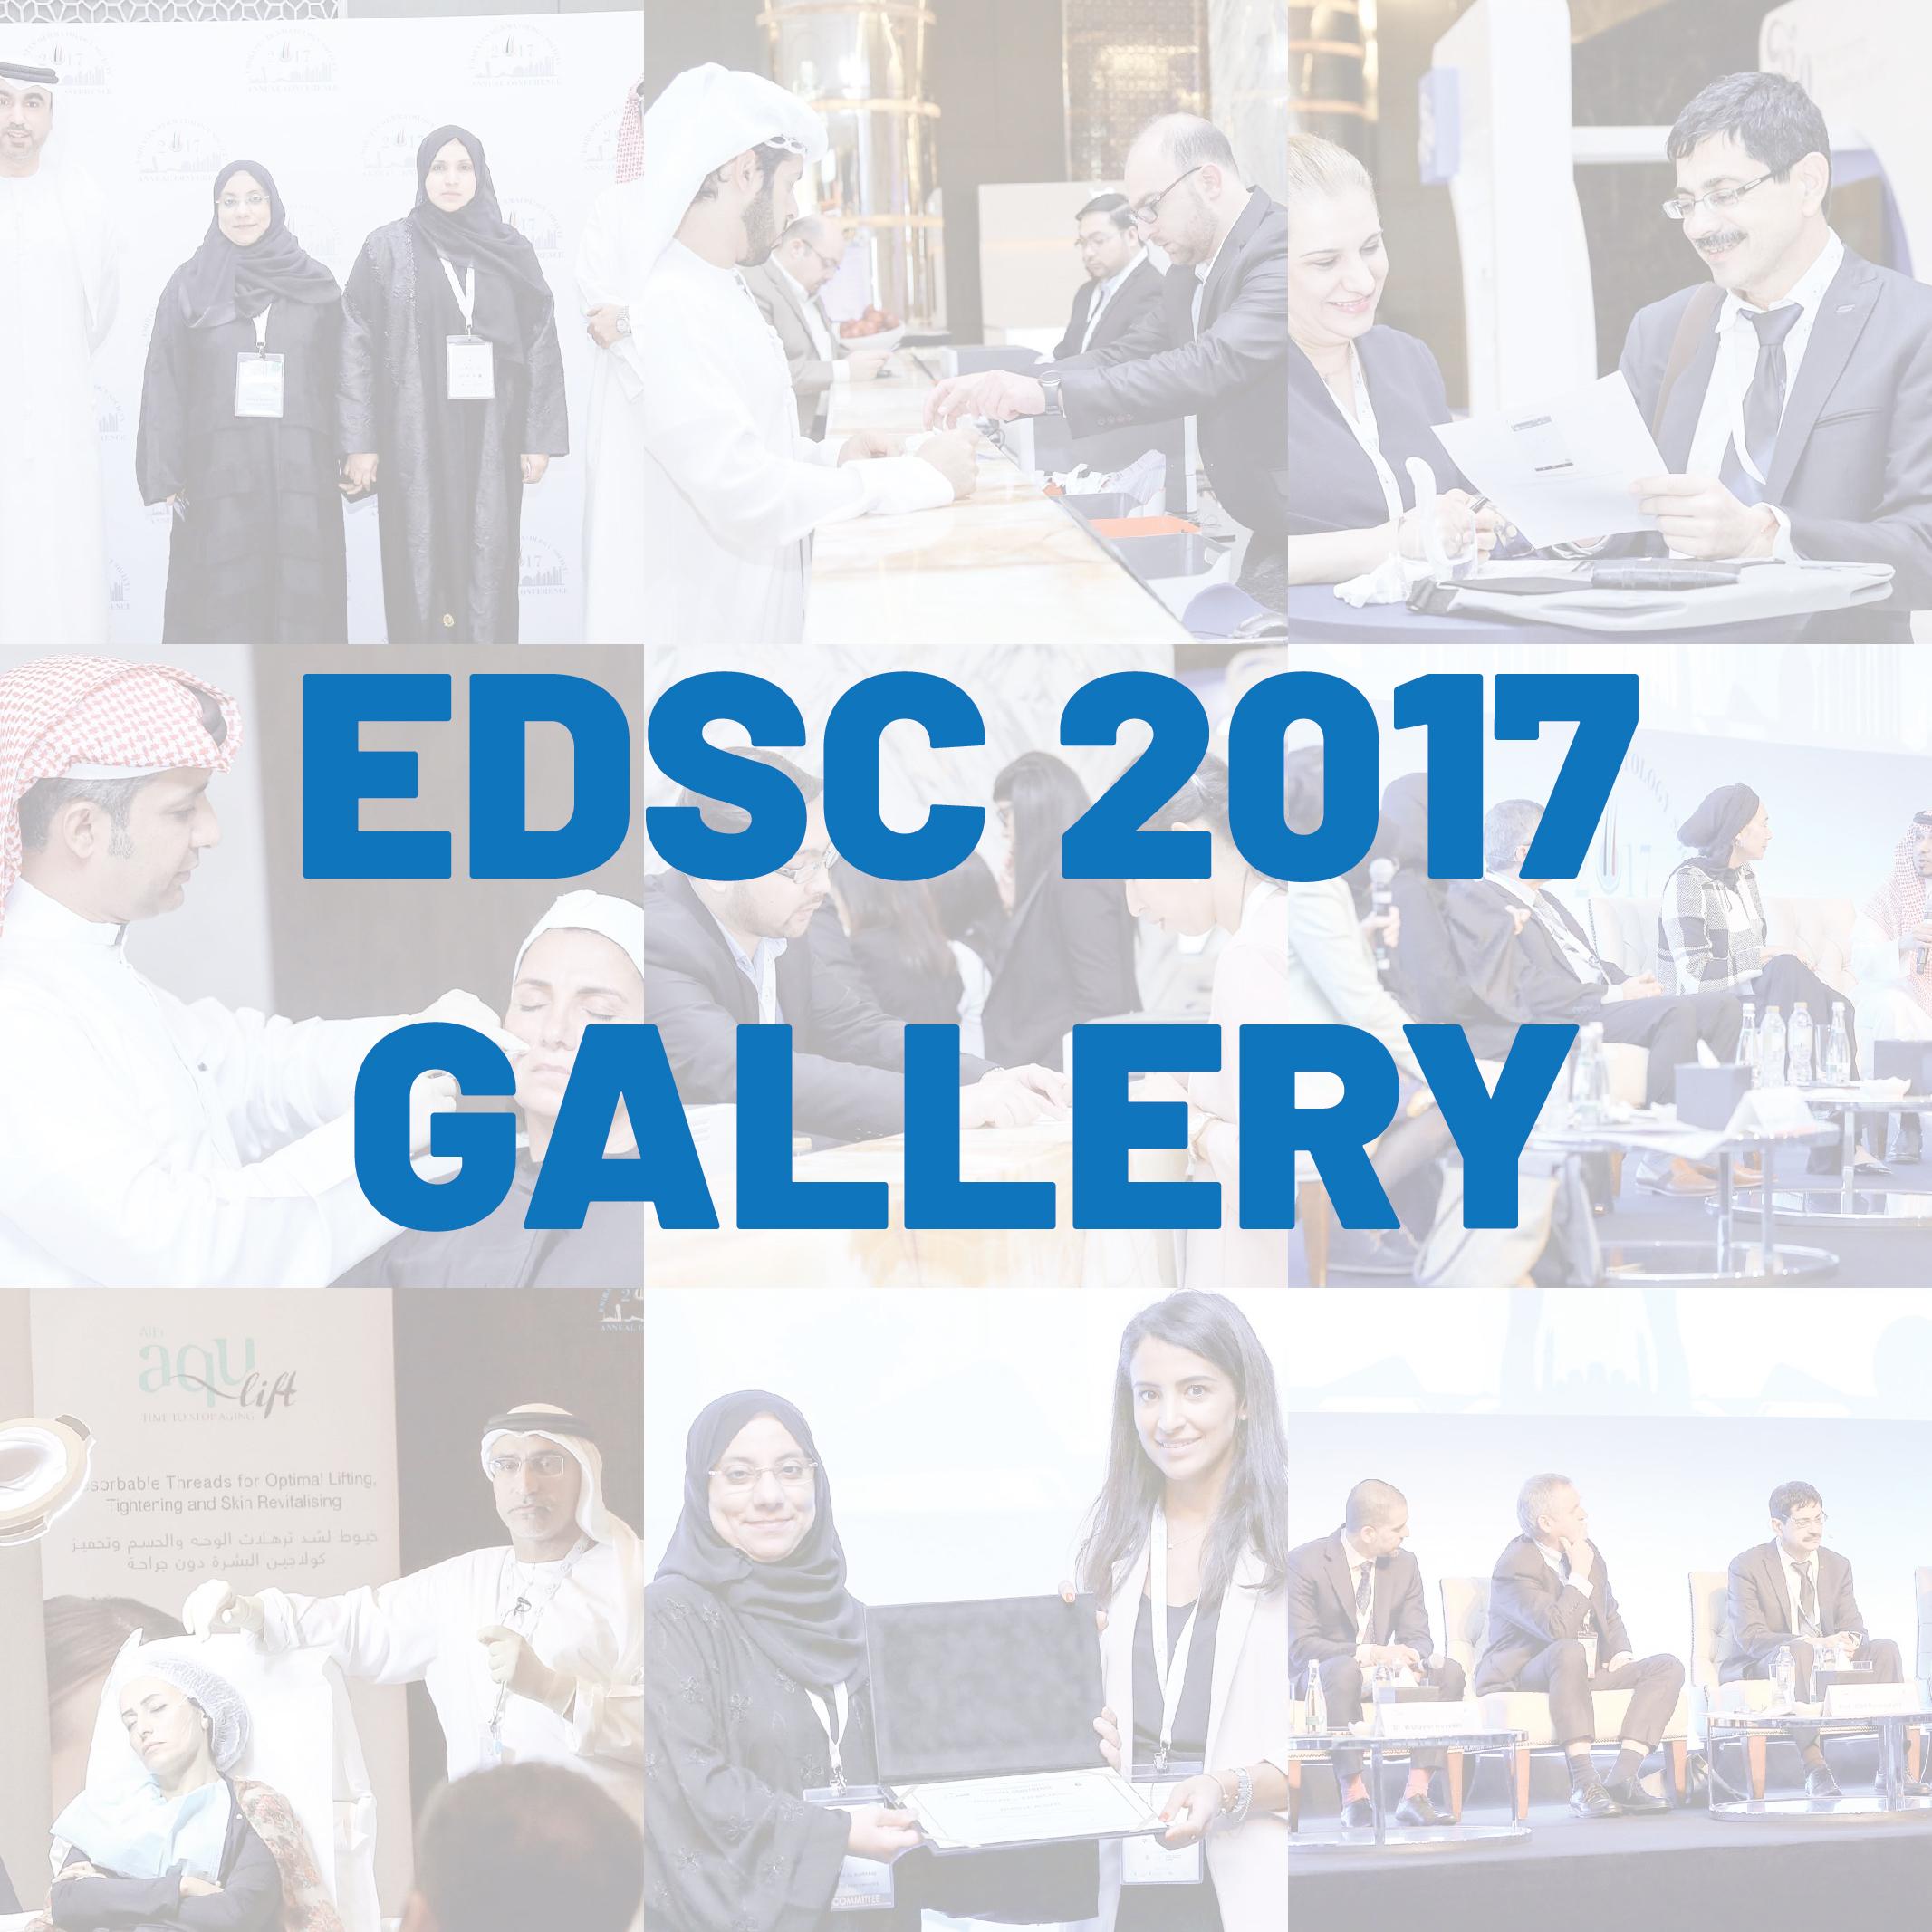 EDSC 2017 GALLERY